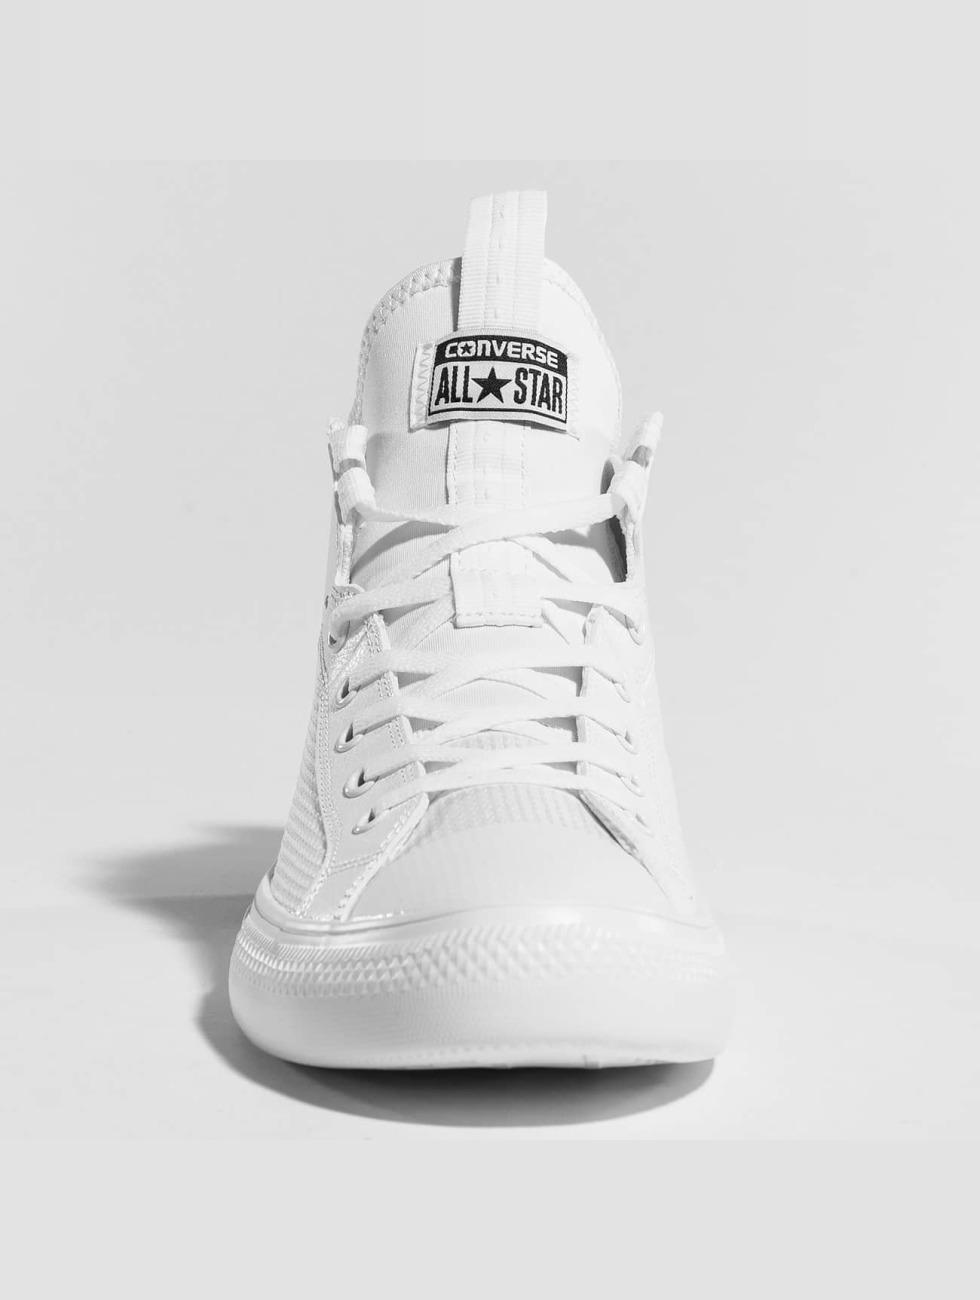 Converse Schoen / Sneaker Chuck Taylor All Star I Vidd 413786 Shopping På Nettet Gratis Frakt Omhandler Salg På Nettet Shopping På Nettet Opprinnelige RLqUwbjU